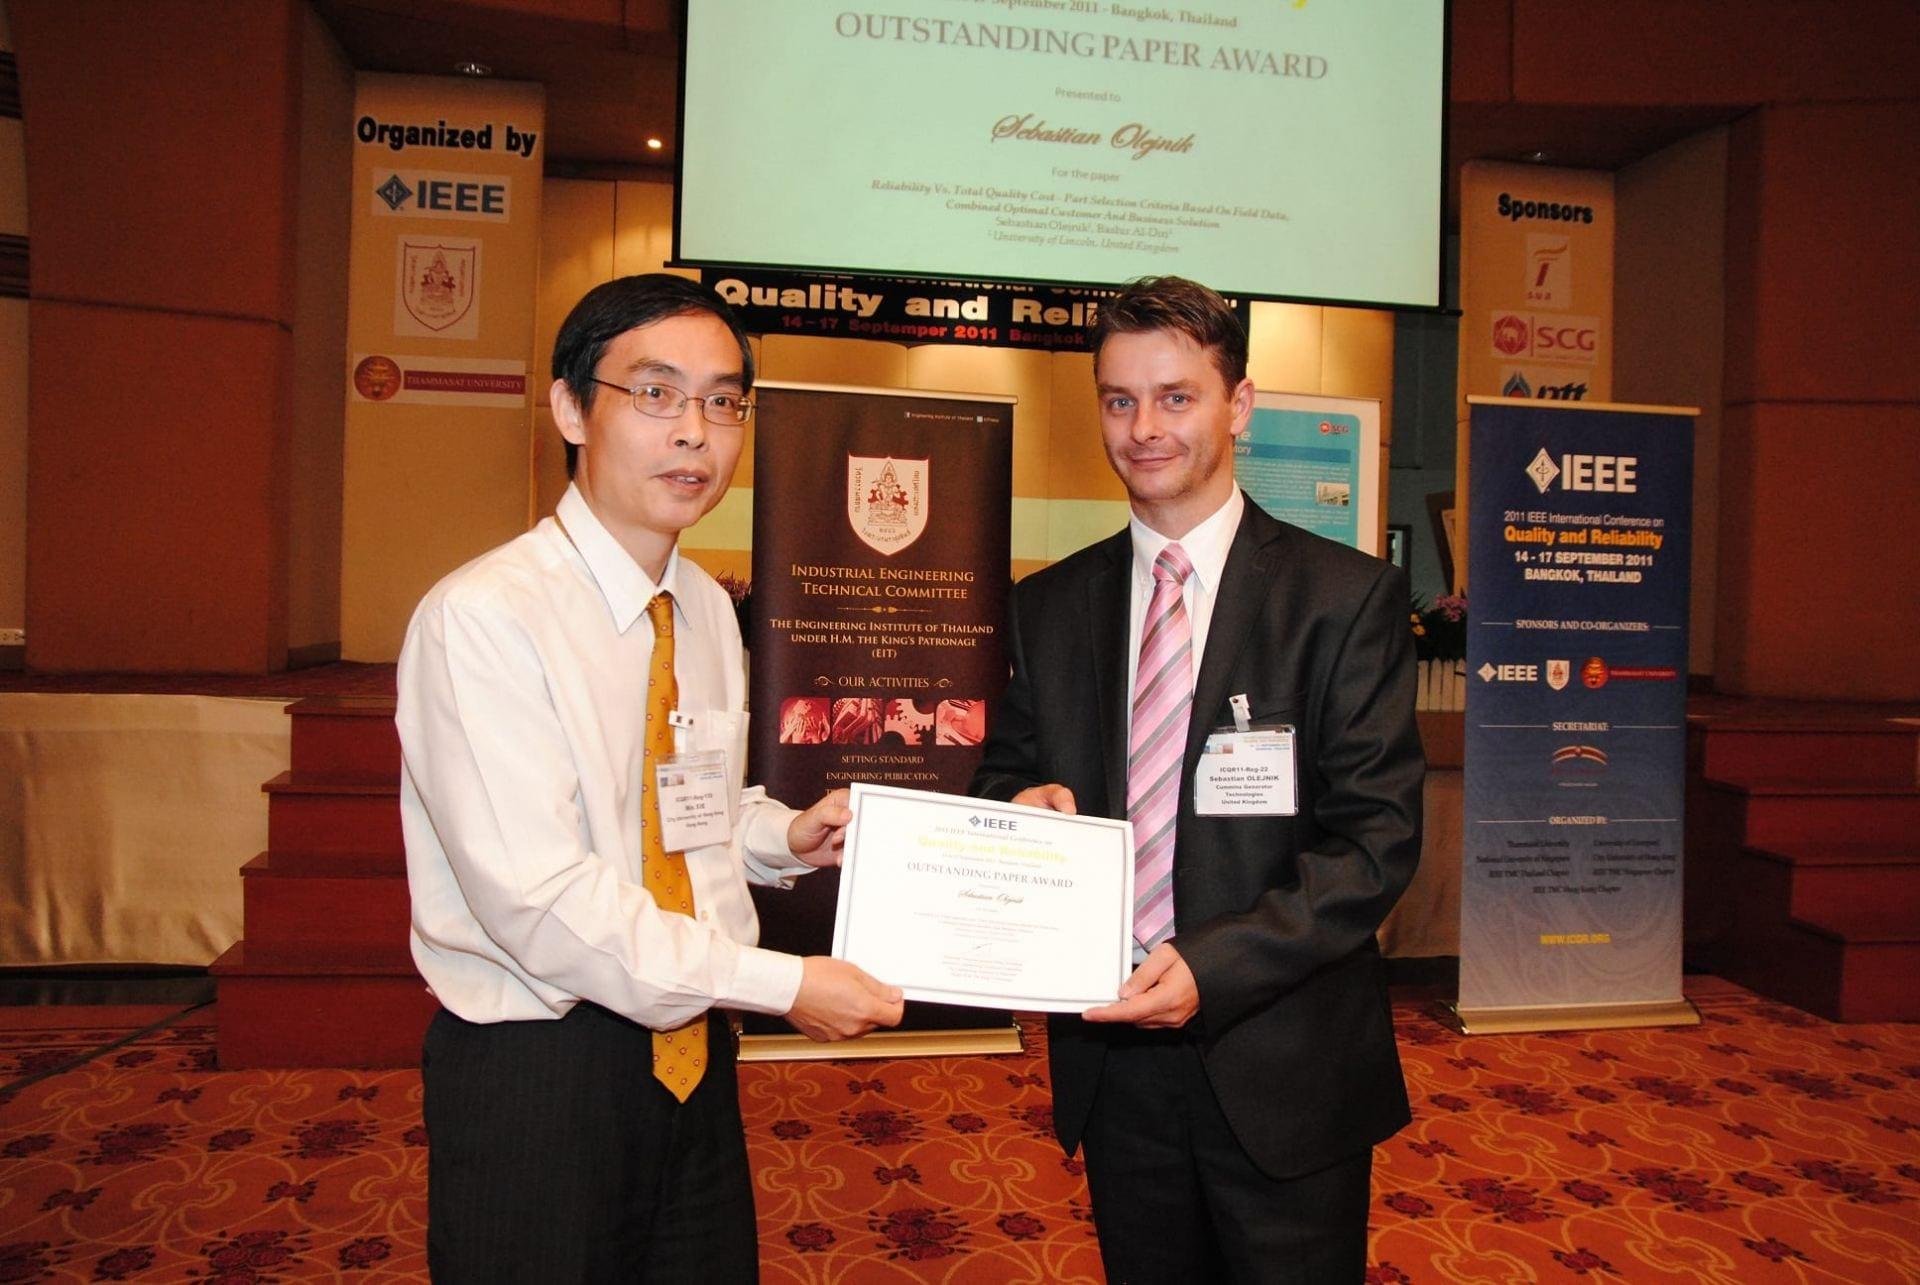 Sebastian Olejnik, ICQR2011 Outstanding Paper Award